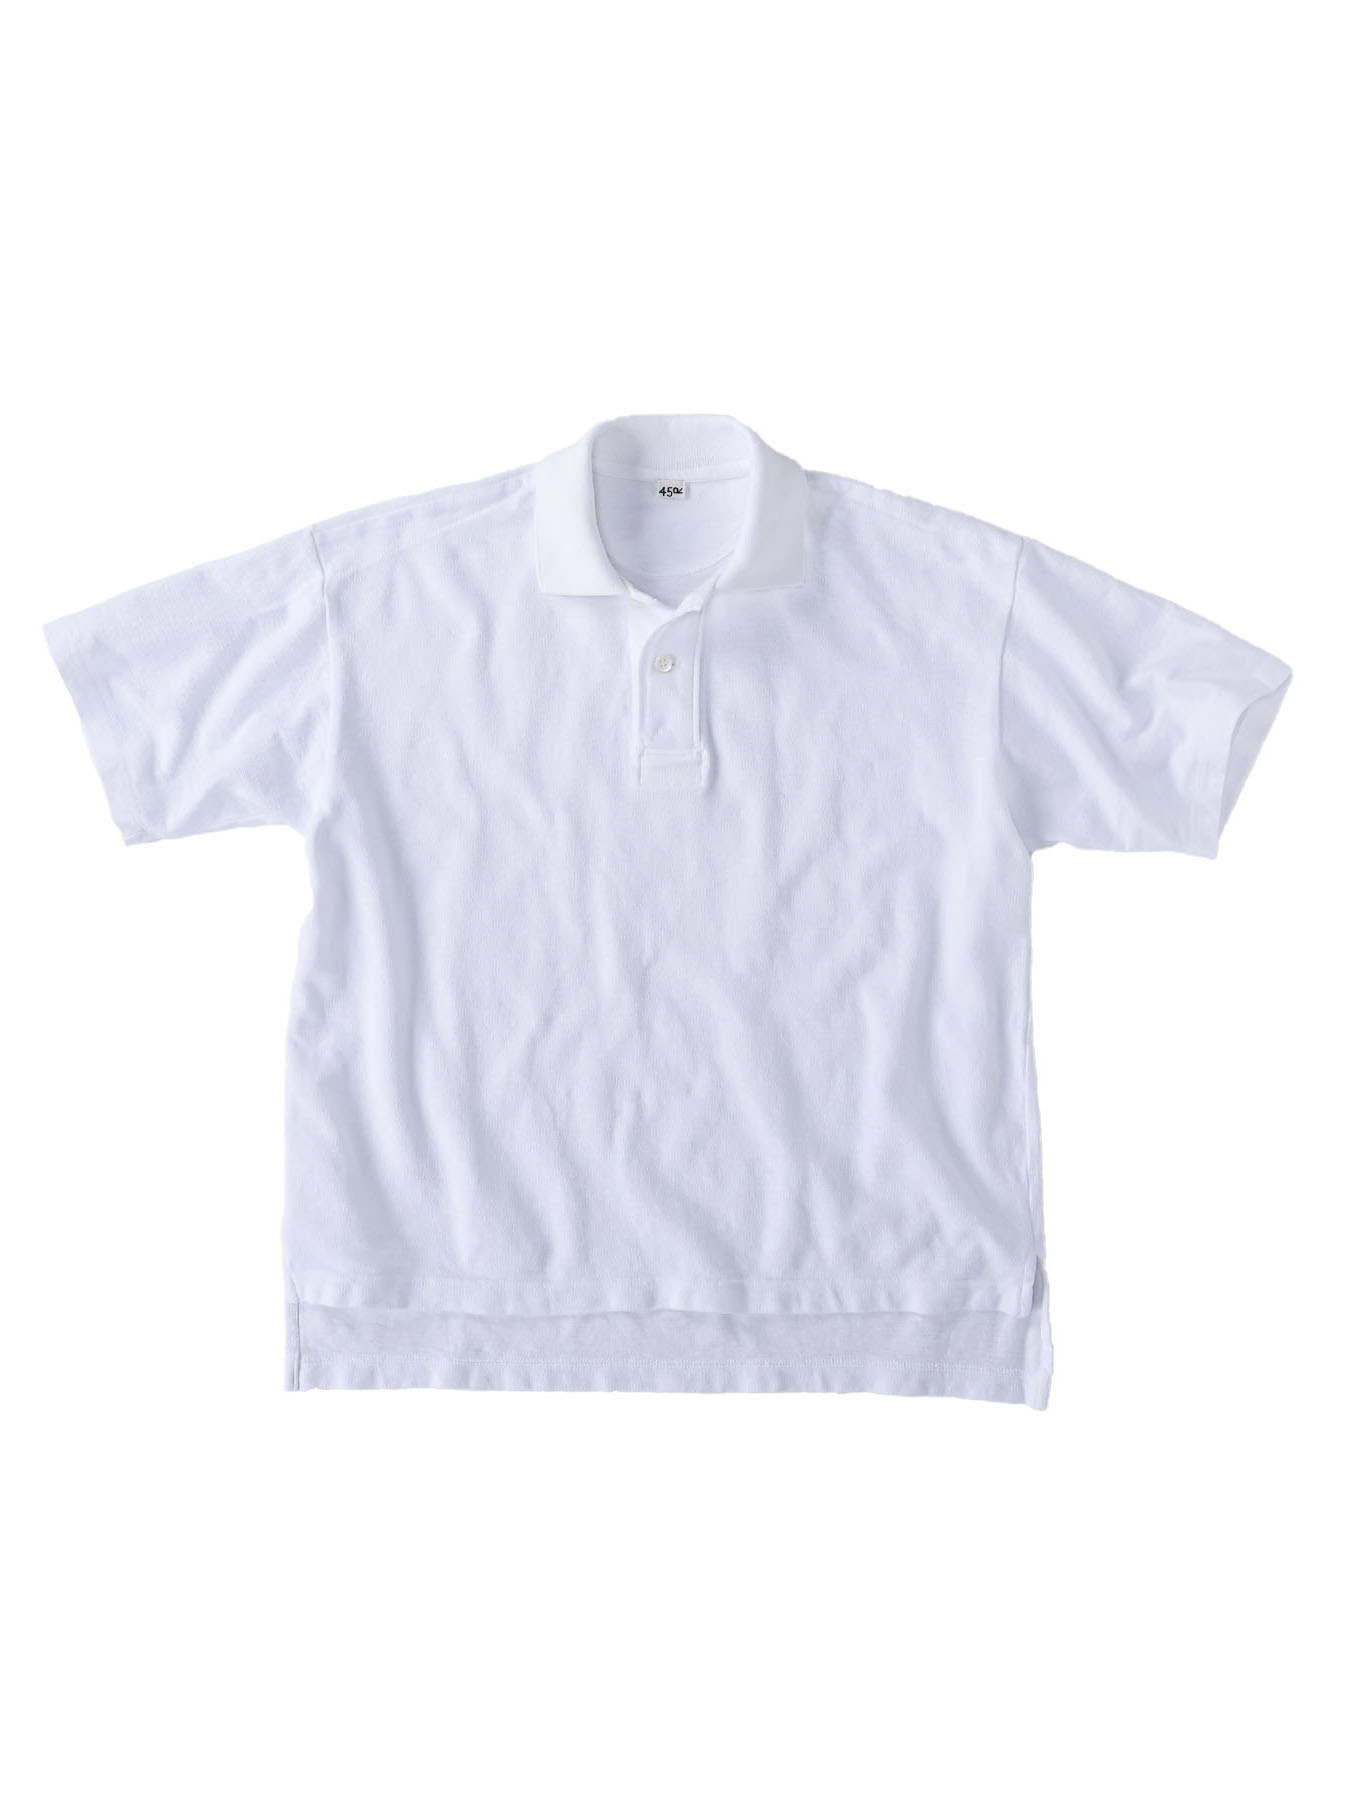 Kanoko Ocean Shiokaze Short-sleeved Polo Shirt (0521)-4